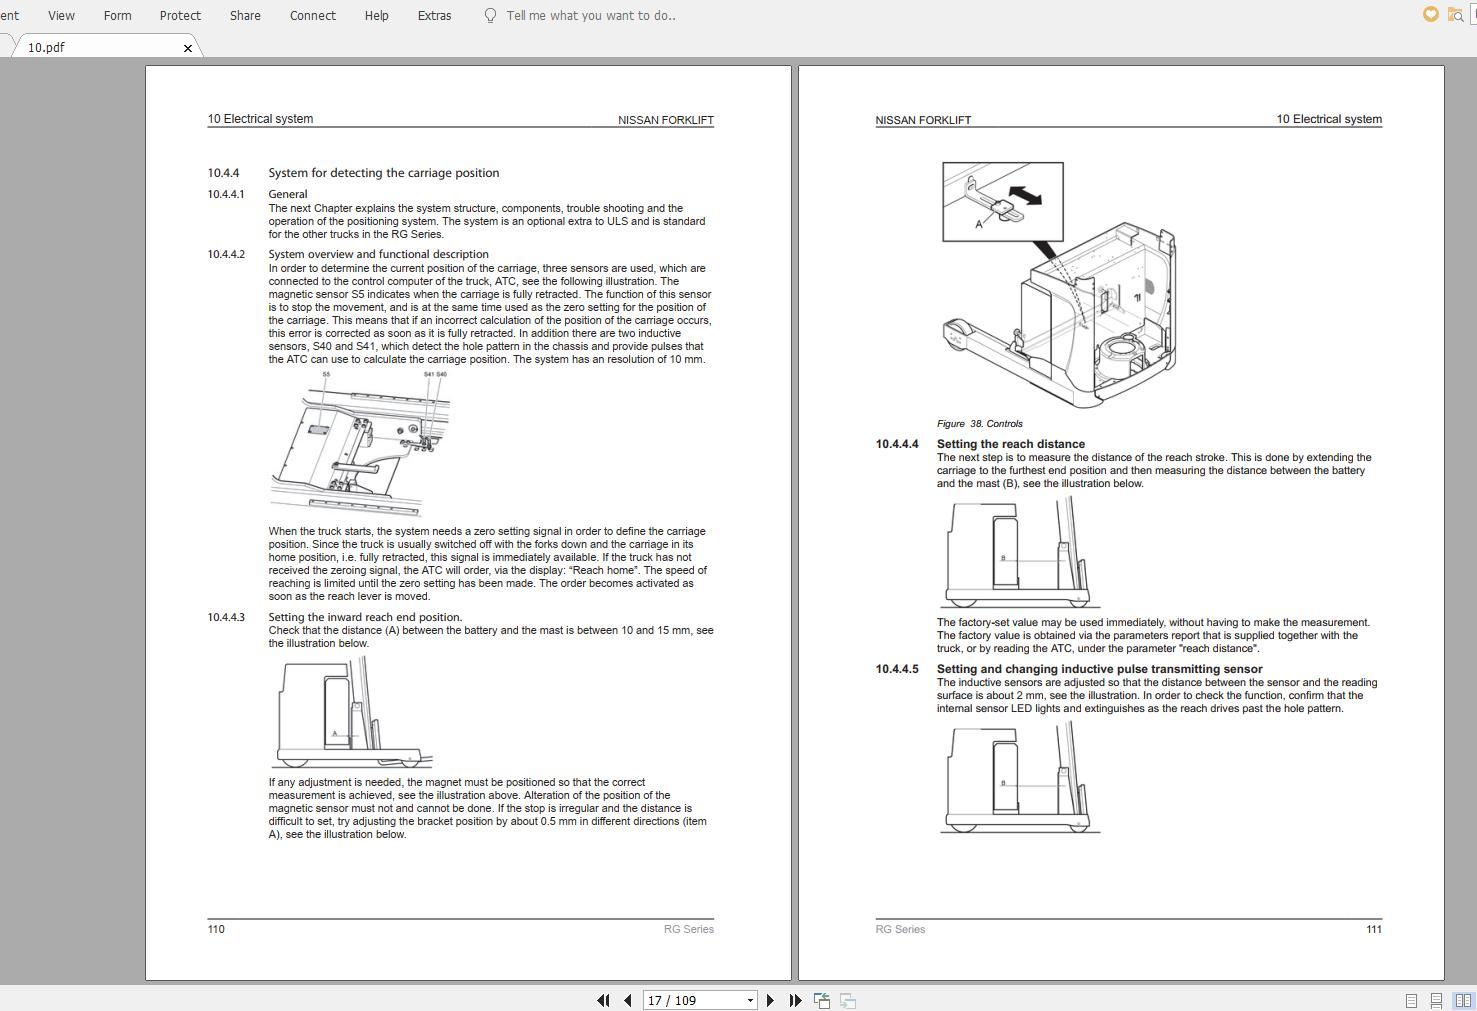 Nissan_Forklift_Warehouse_RG_Series_Service_ManualEN_4